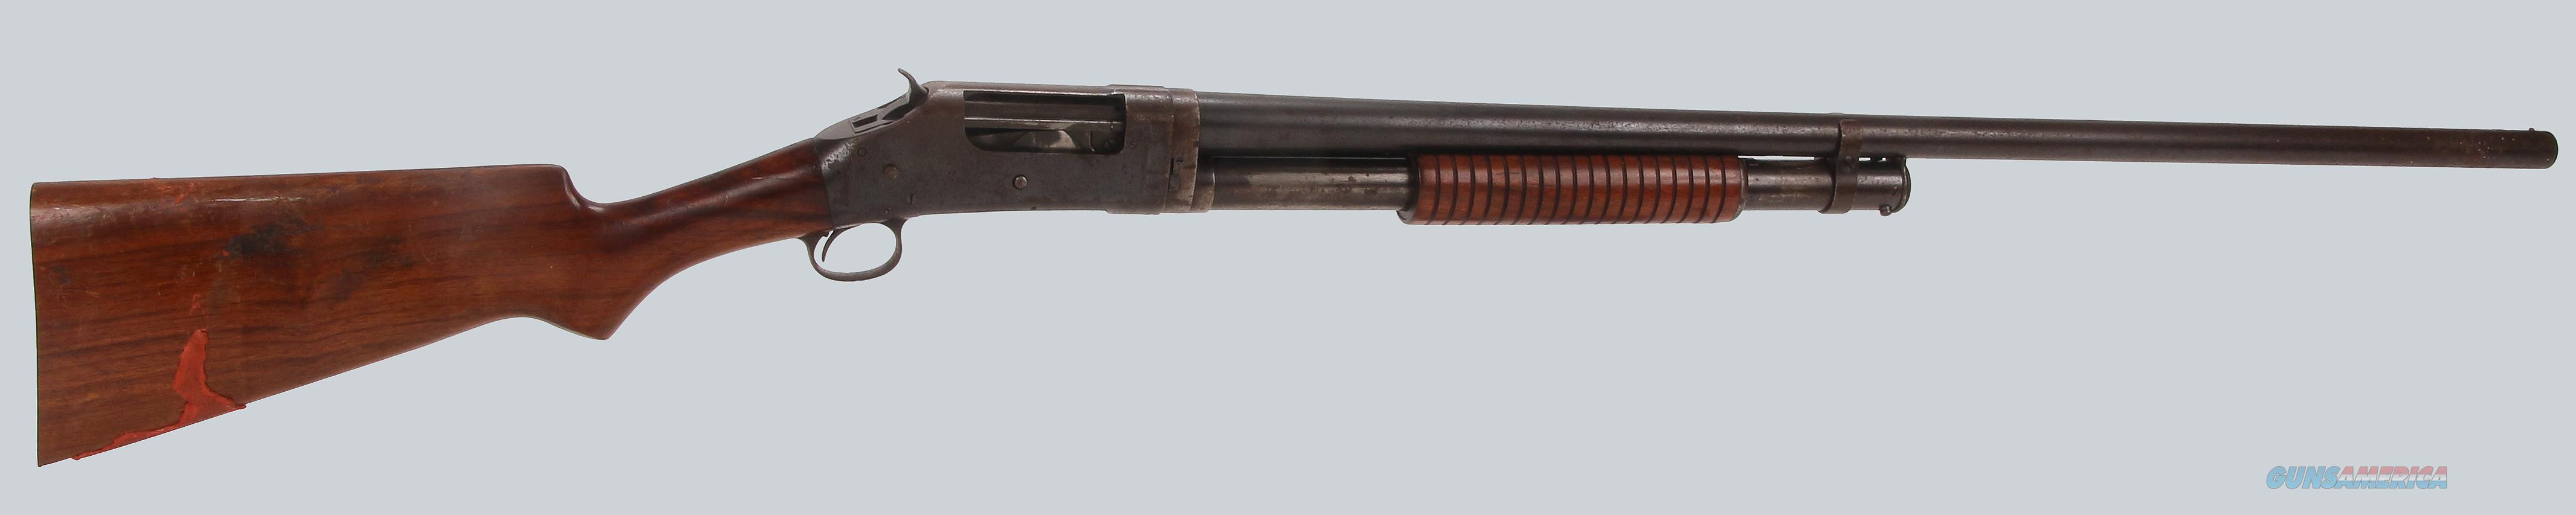 Winchester Pump 12ga 1897 Shotgun  Guns > Shotguns > Winchester Shotguns - Modern > Pump Action > Hunting